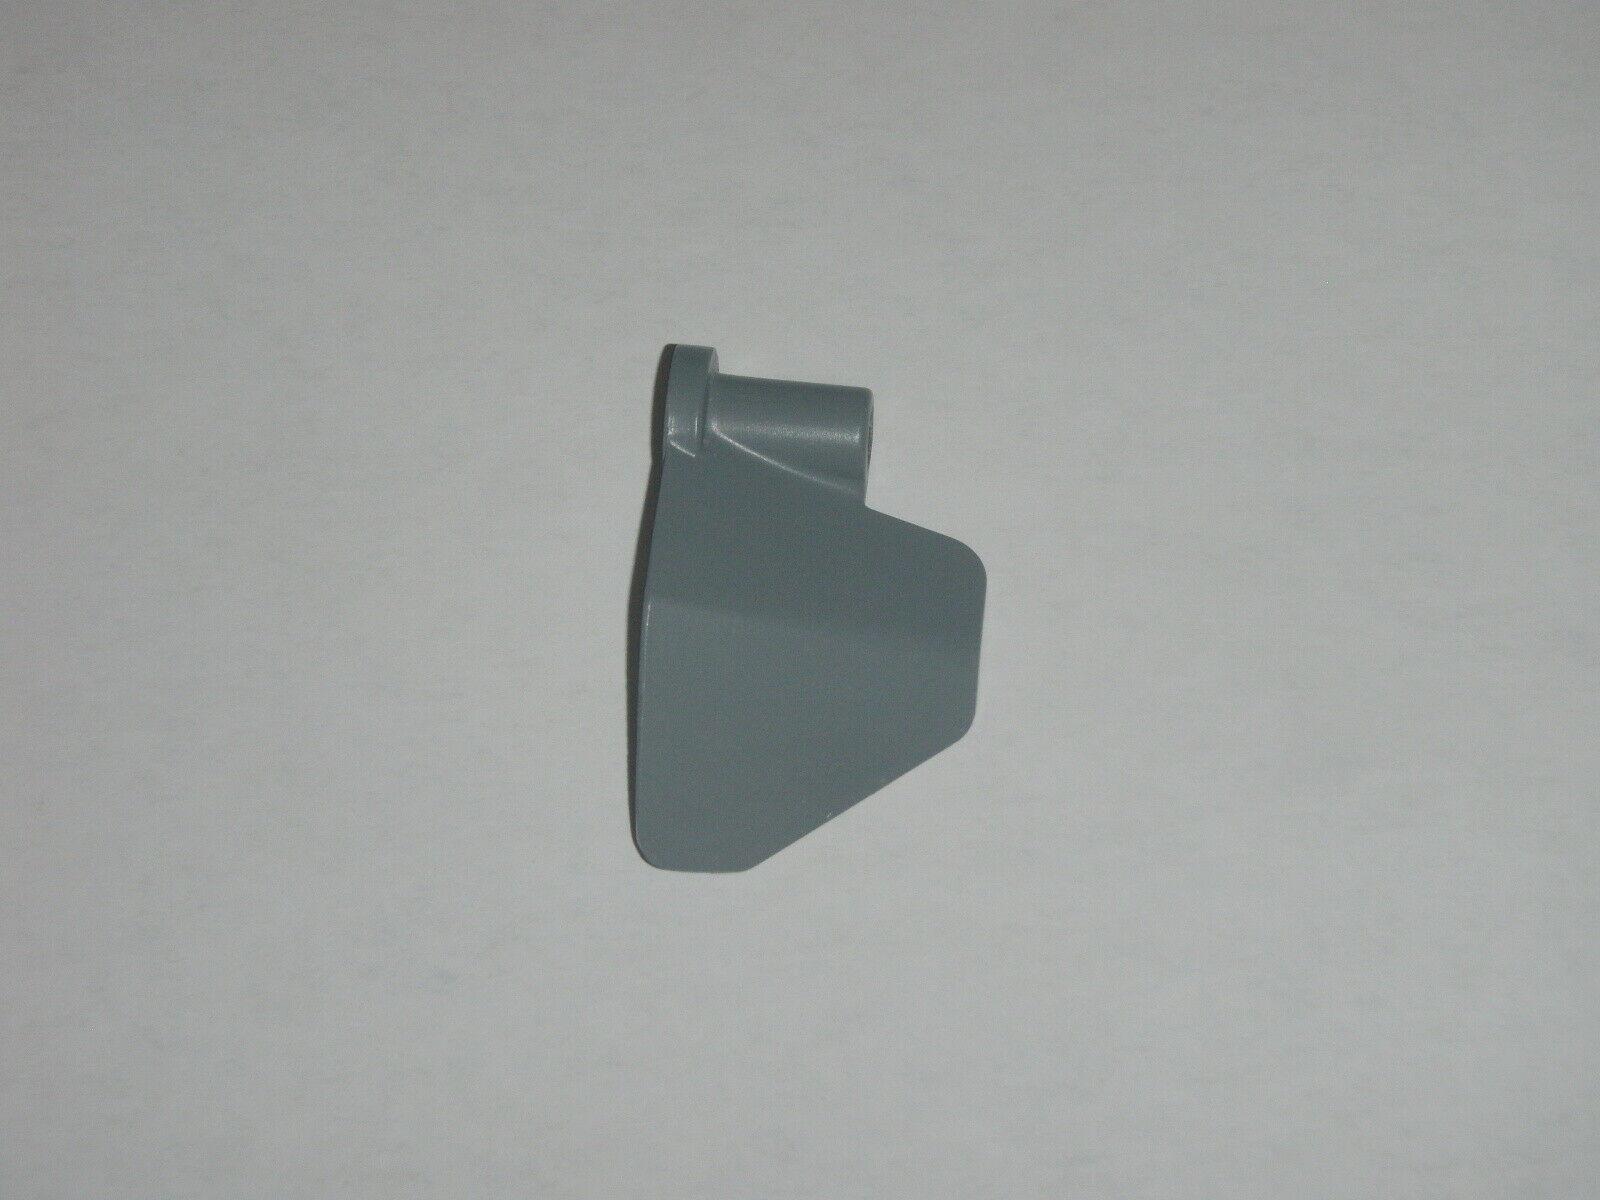 Farberware Bread Maker Machine Original Paddle for Models FTR700 (OEM) FTR700DL image 3